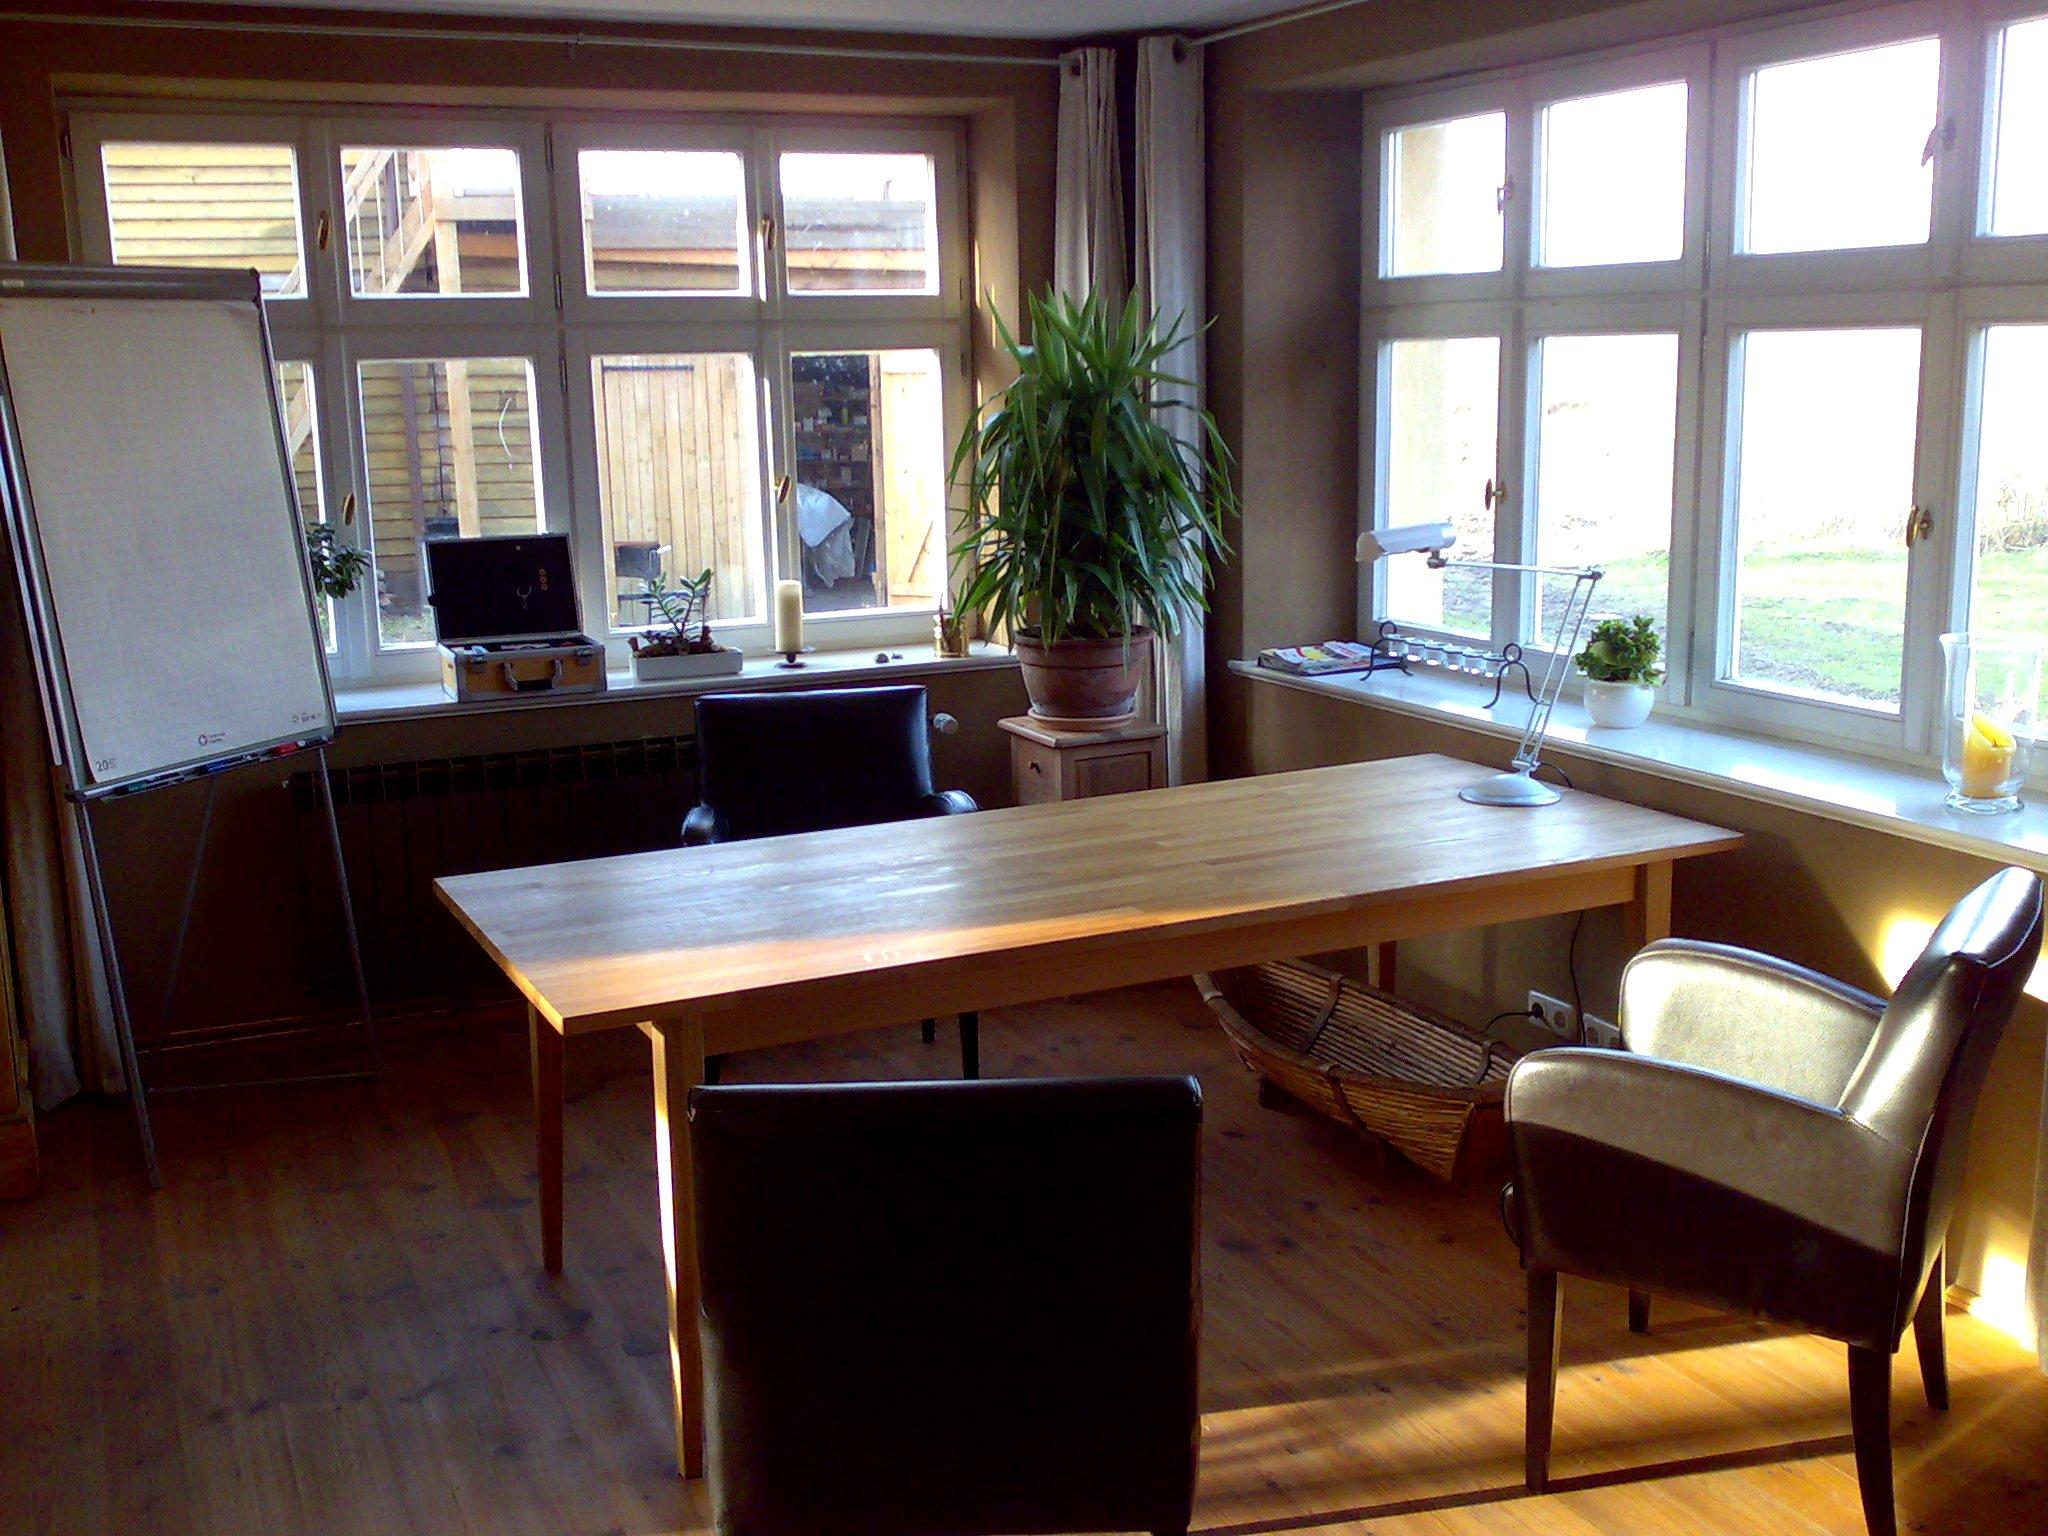 refugium uckermark tagungsh user. Black Bedroom Furniture Sets. Home Design Ideas